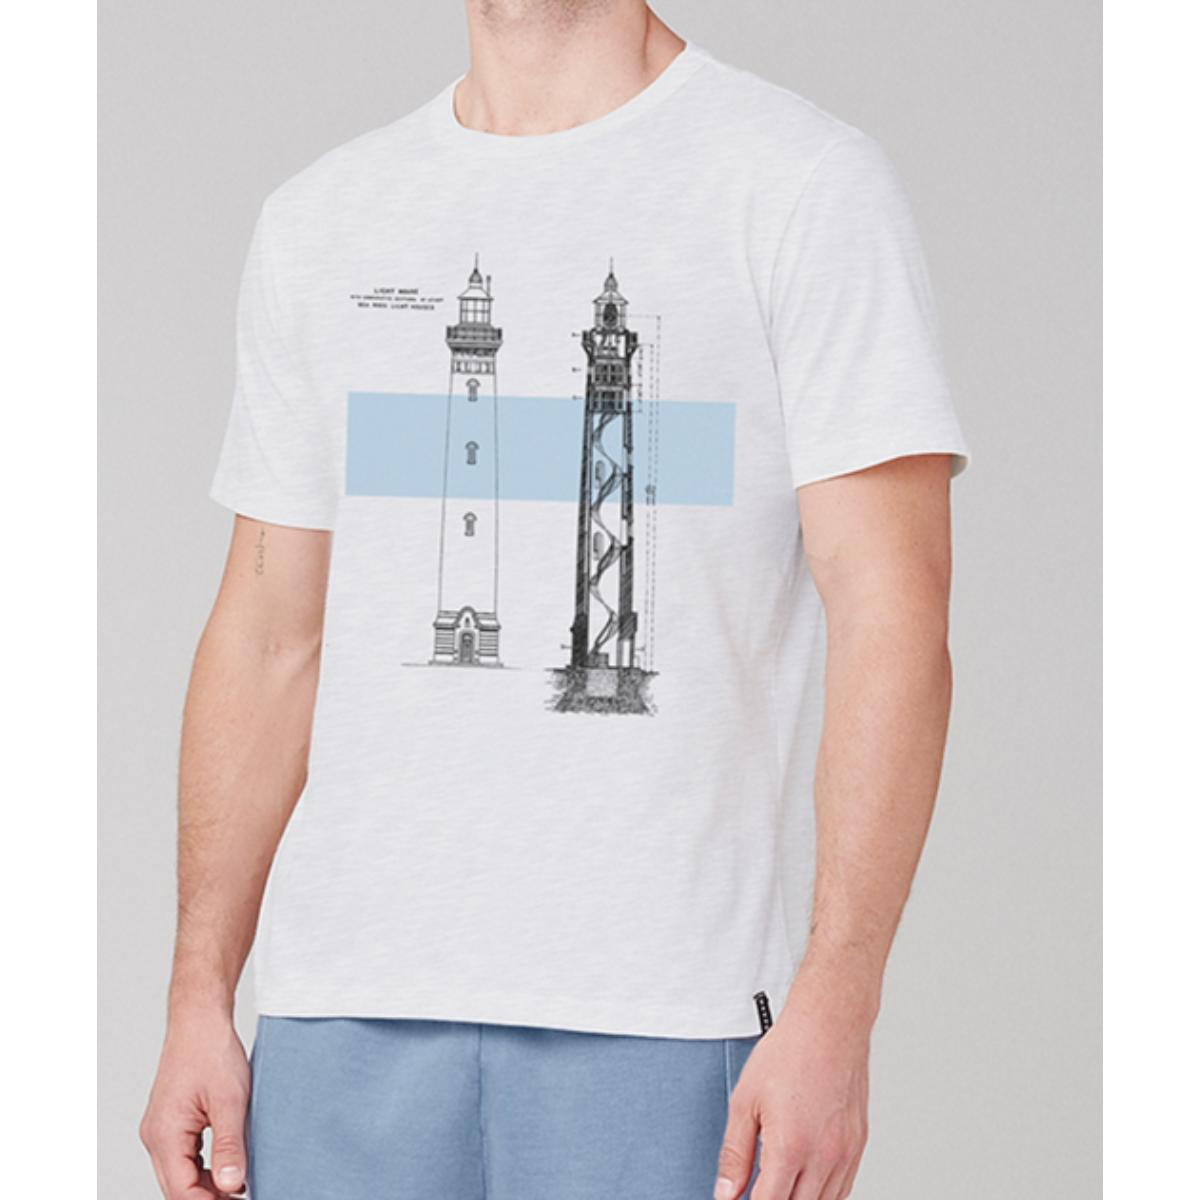 Camiseta Masculina Dzarm 6r7m N0aen Branco